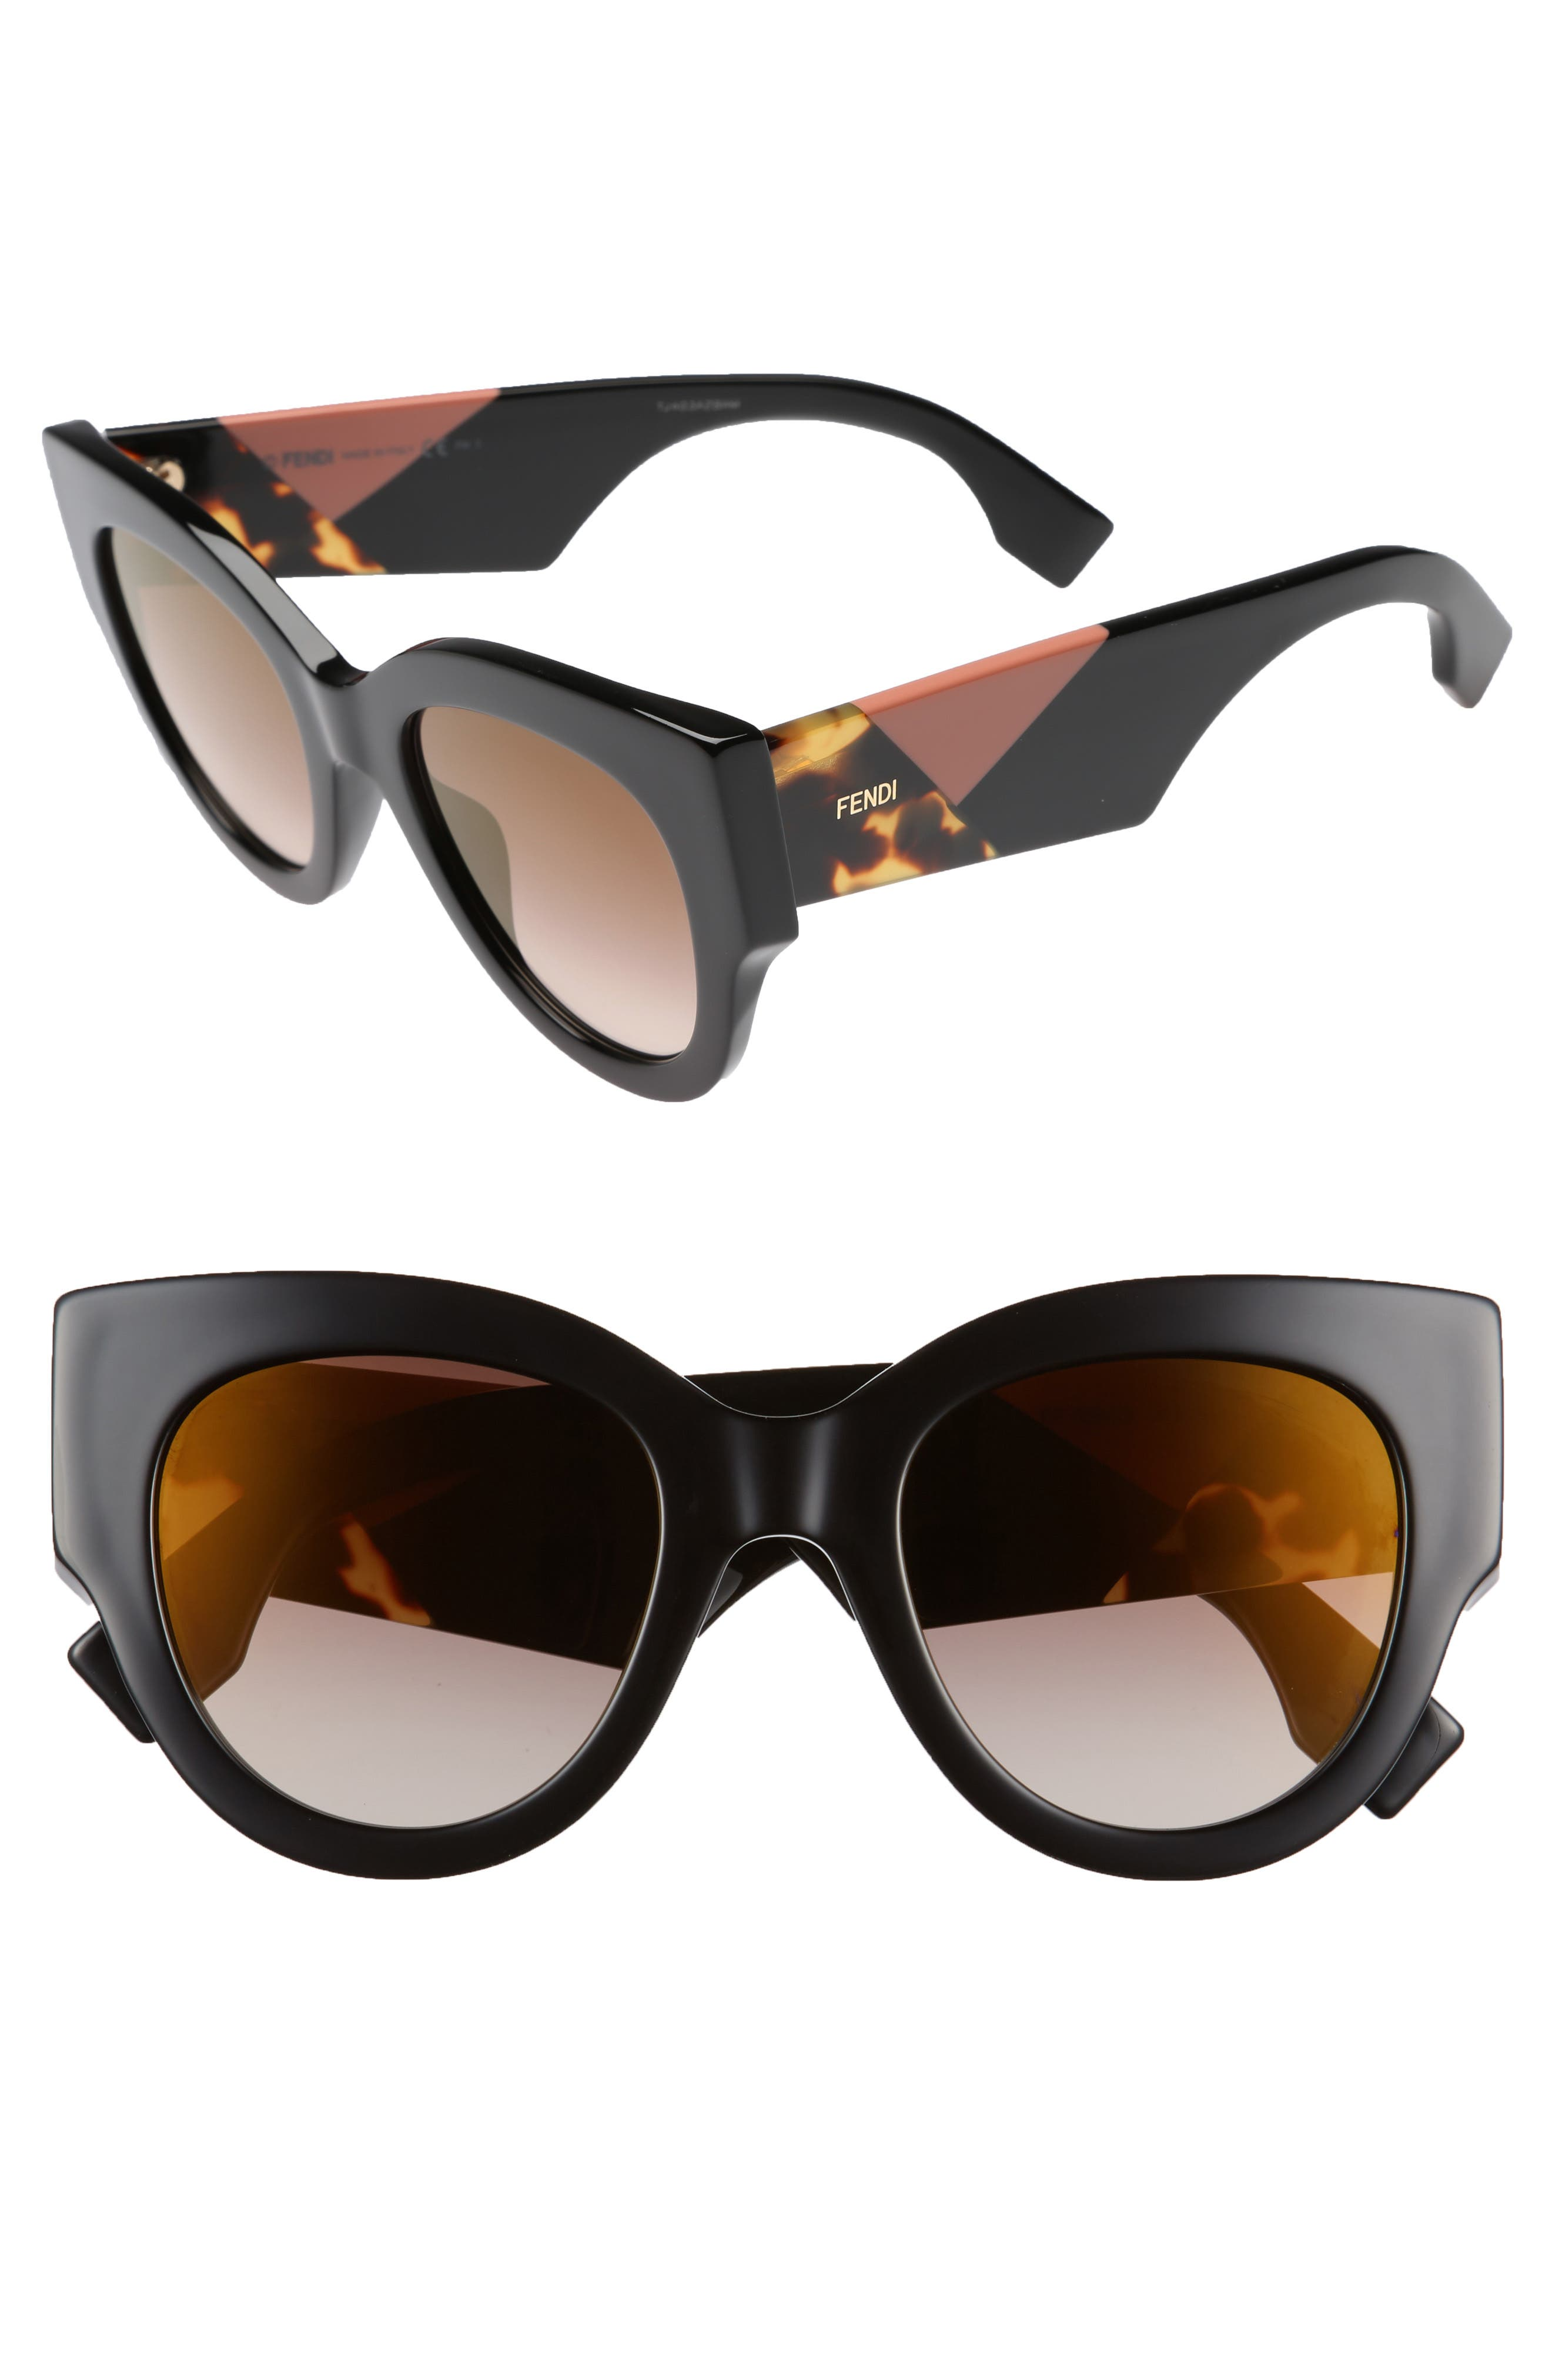 51mm Cat Eye Sunglasses,                             Main thumbnail 1, color,                             001